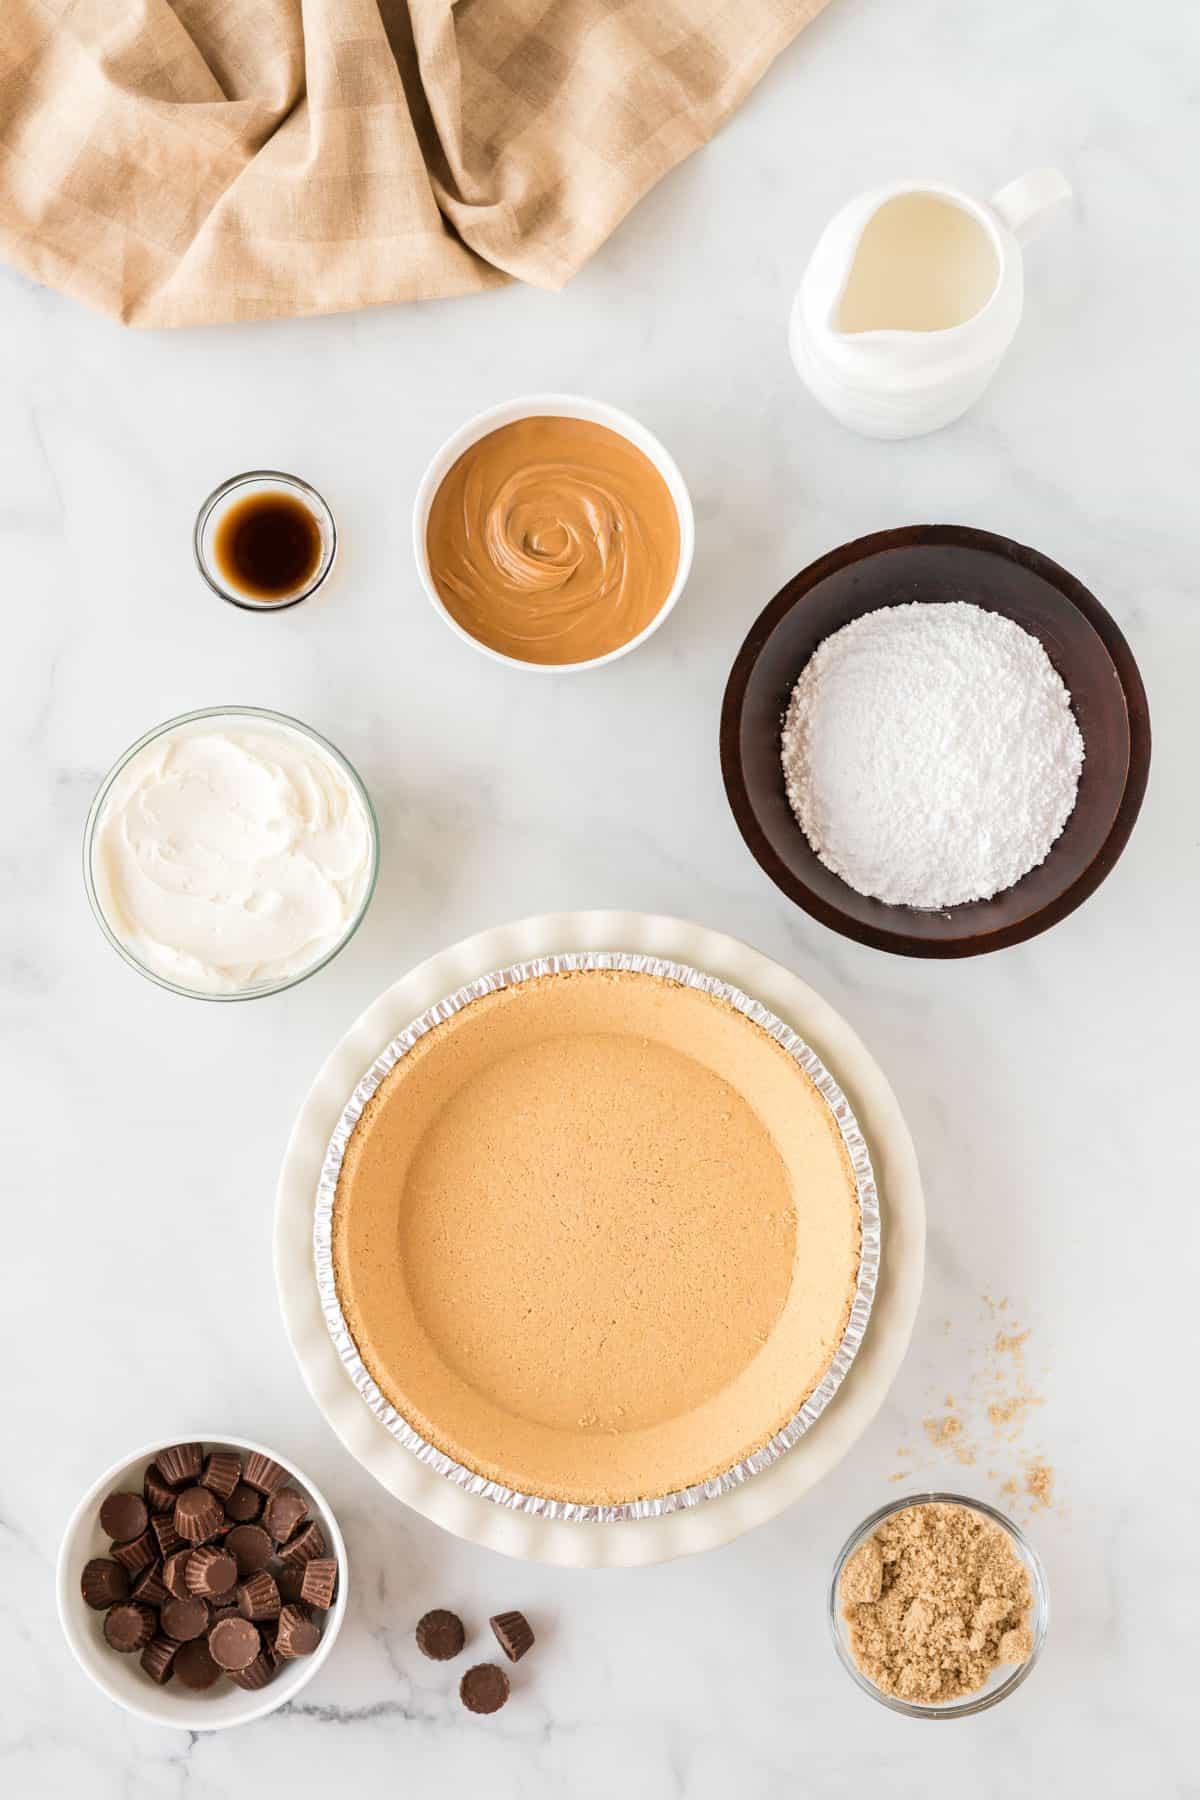 ingredients to make peanut butter pie